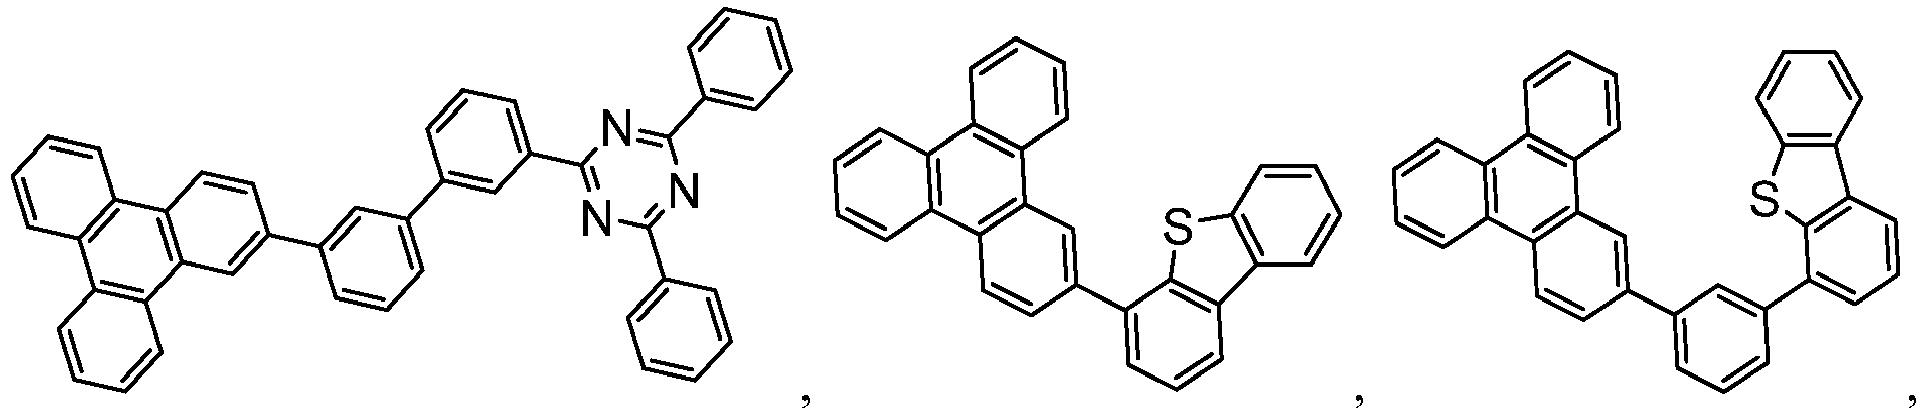 Figure imgb0987